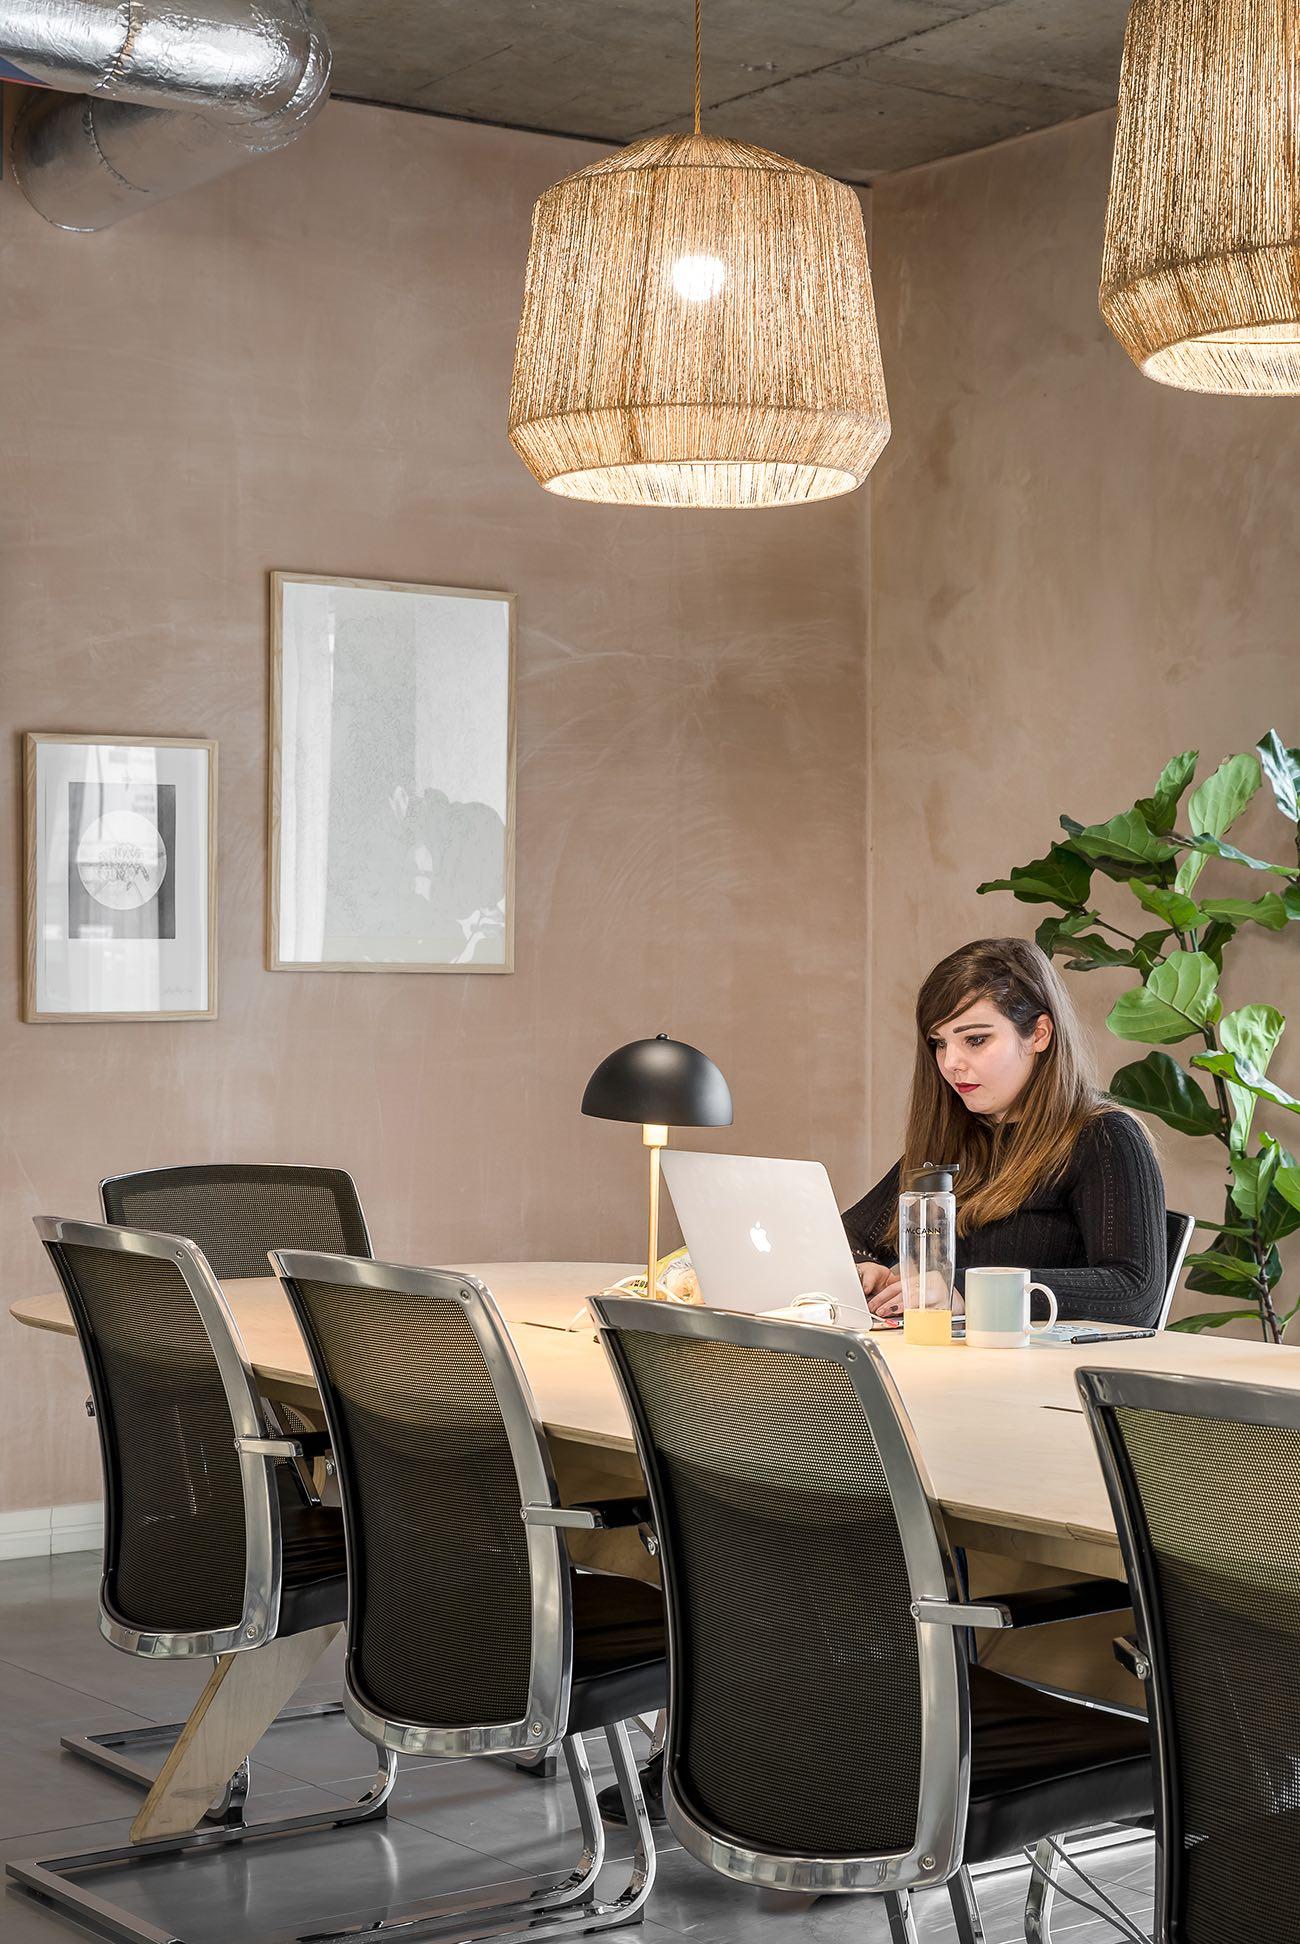 A Look Inside Kinrise's New Leeds Office